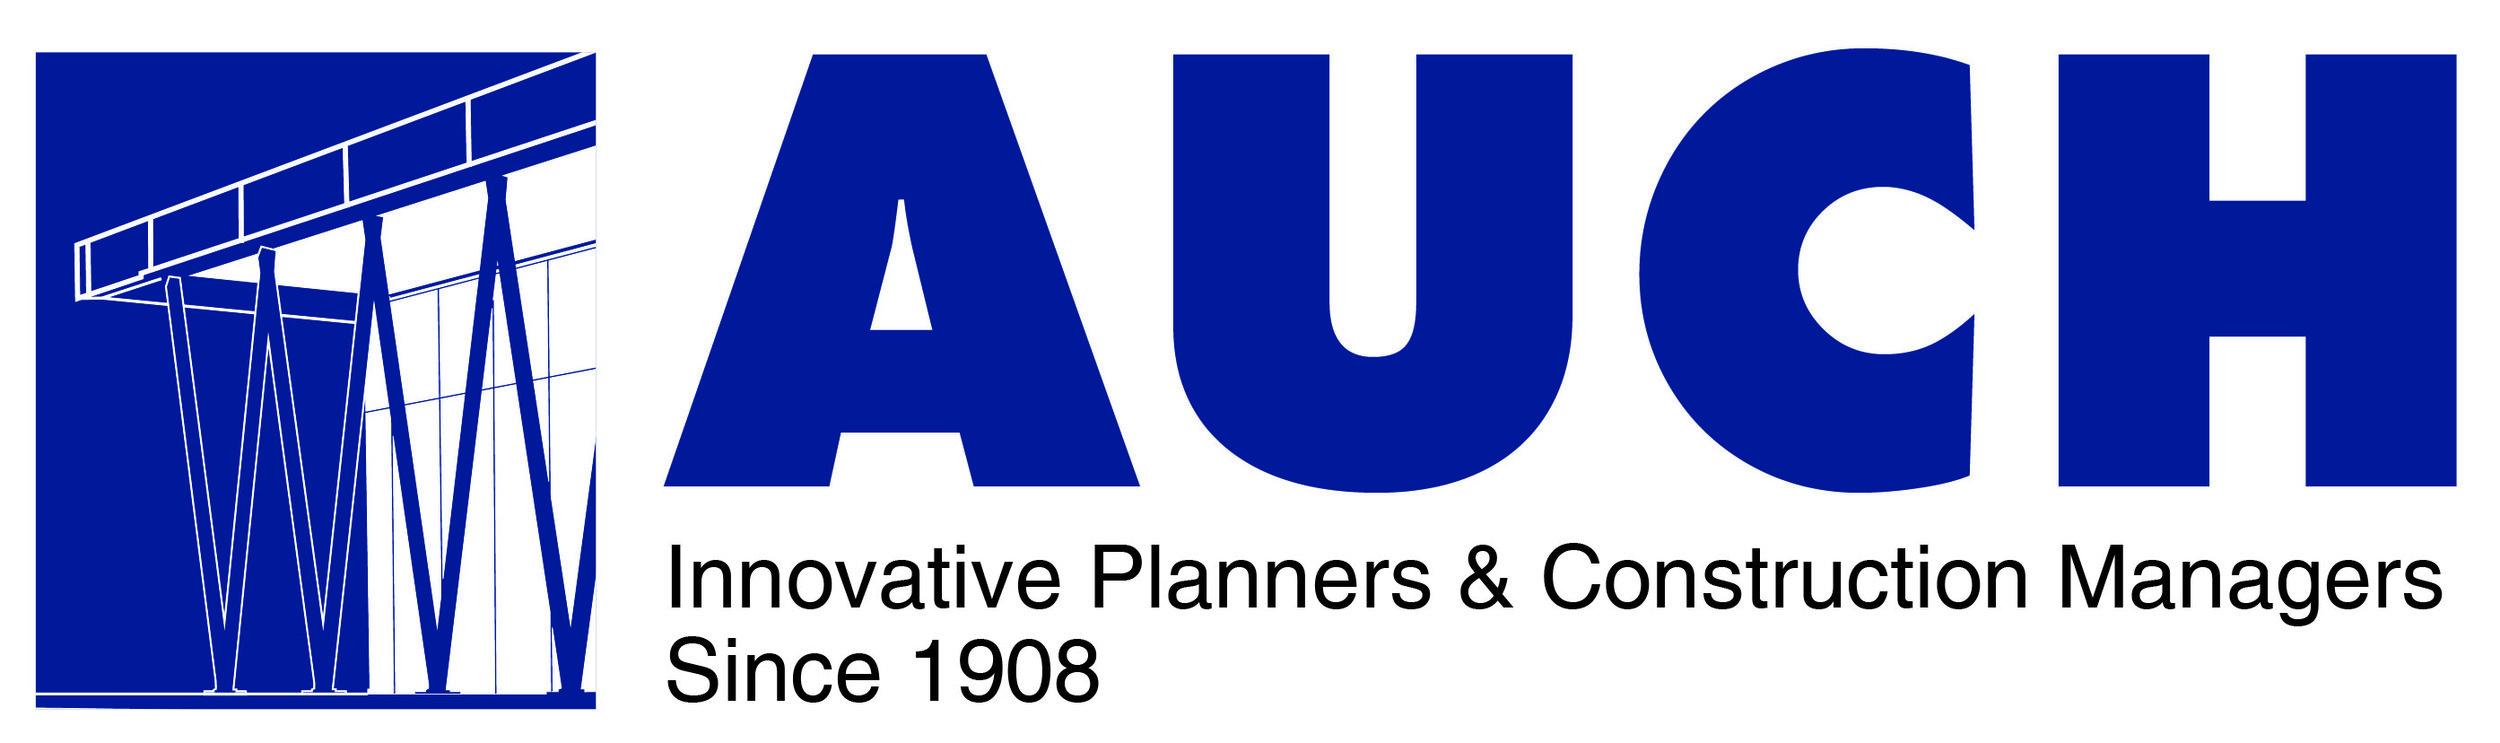 2018-auch-sign-logo.jpg